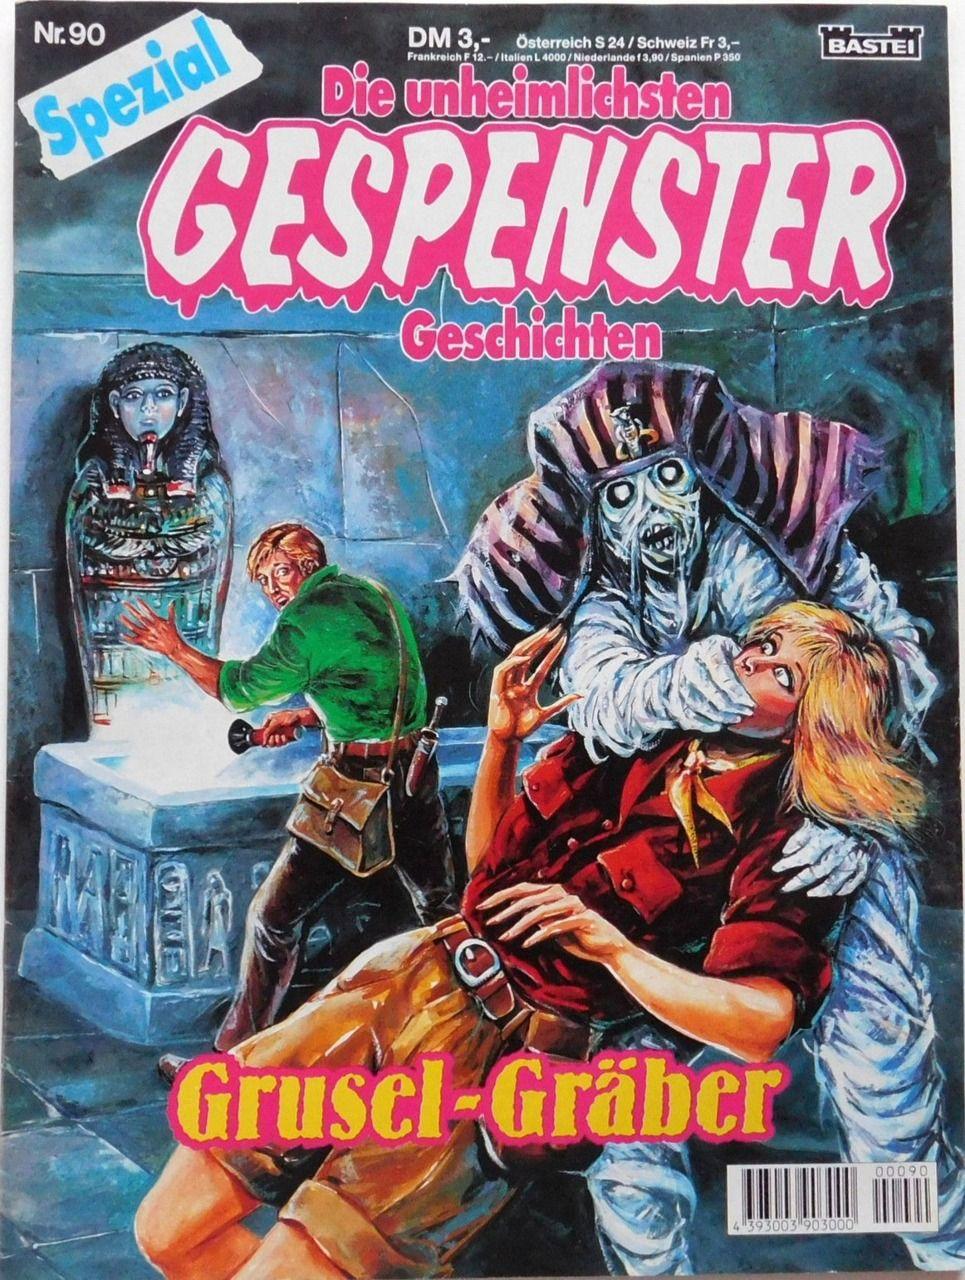 Gespenster Geschichten Spezial #90 - Grusel-Graber